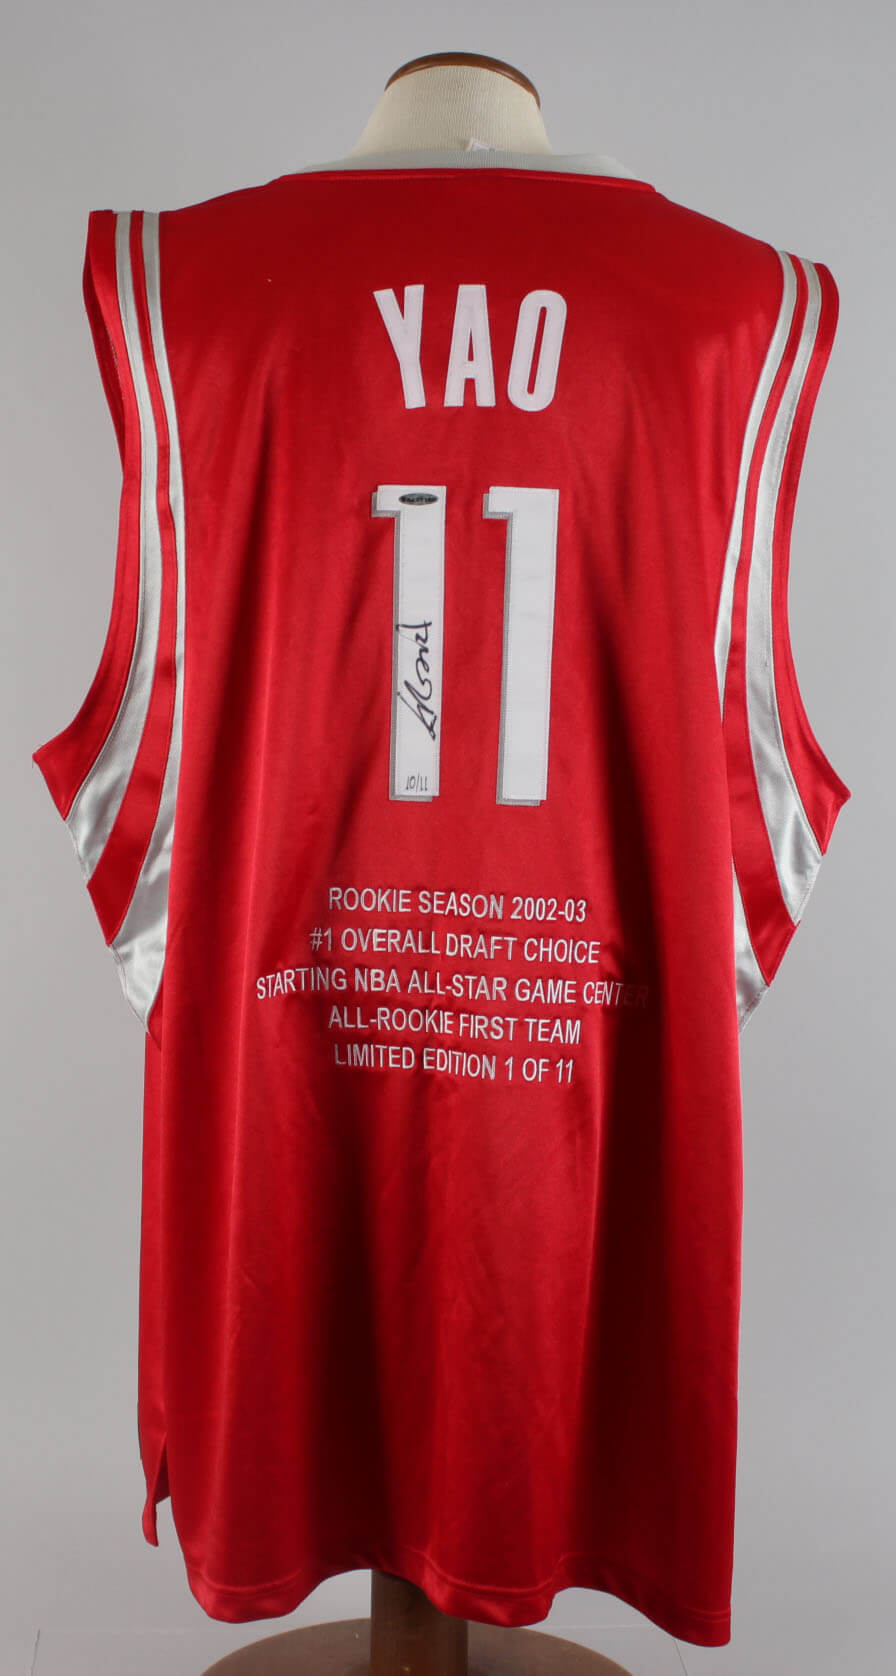 cheaper 55709 590fe Yao Ming Houston Rockets Signed LE 10/11 Jersey & 2002-03 Bowman Auto RC  Card 467/999 - (UDA & BGS)